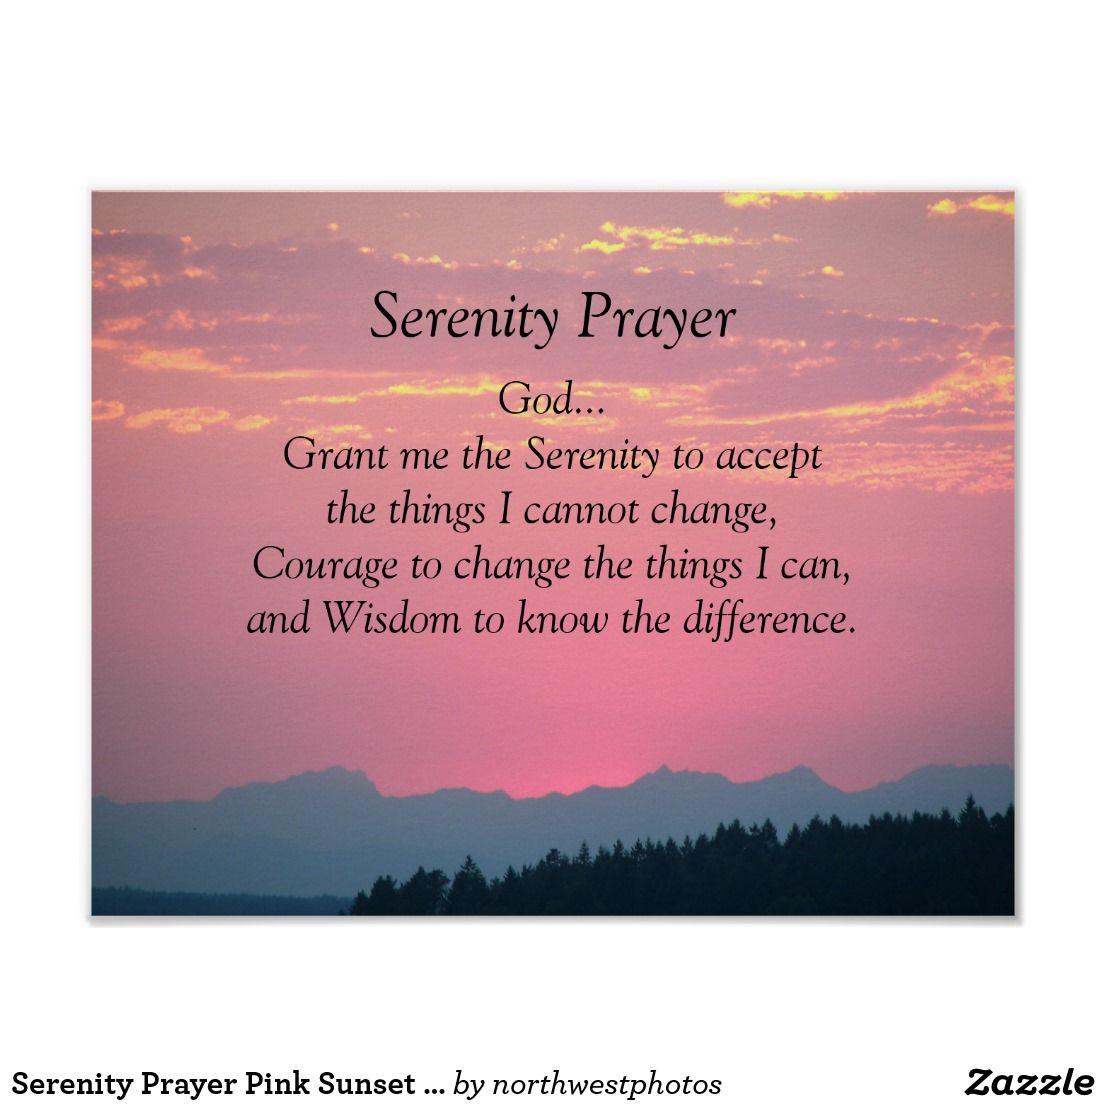 Serenity Prayer Pink Sunset Photographic Poster